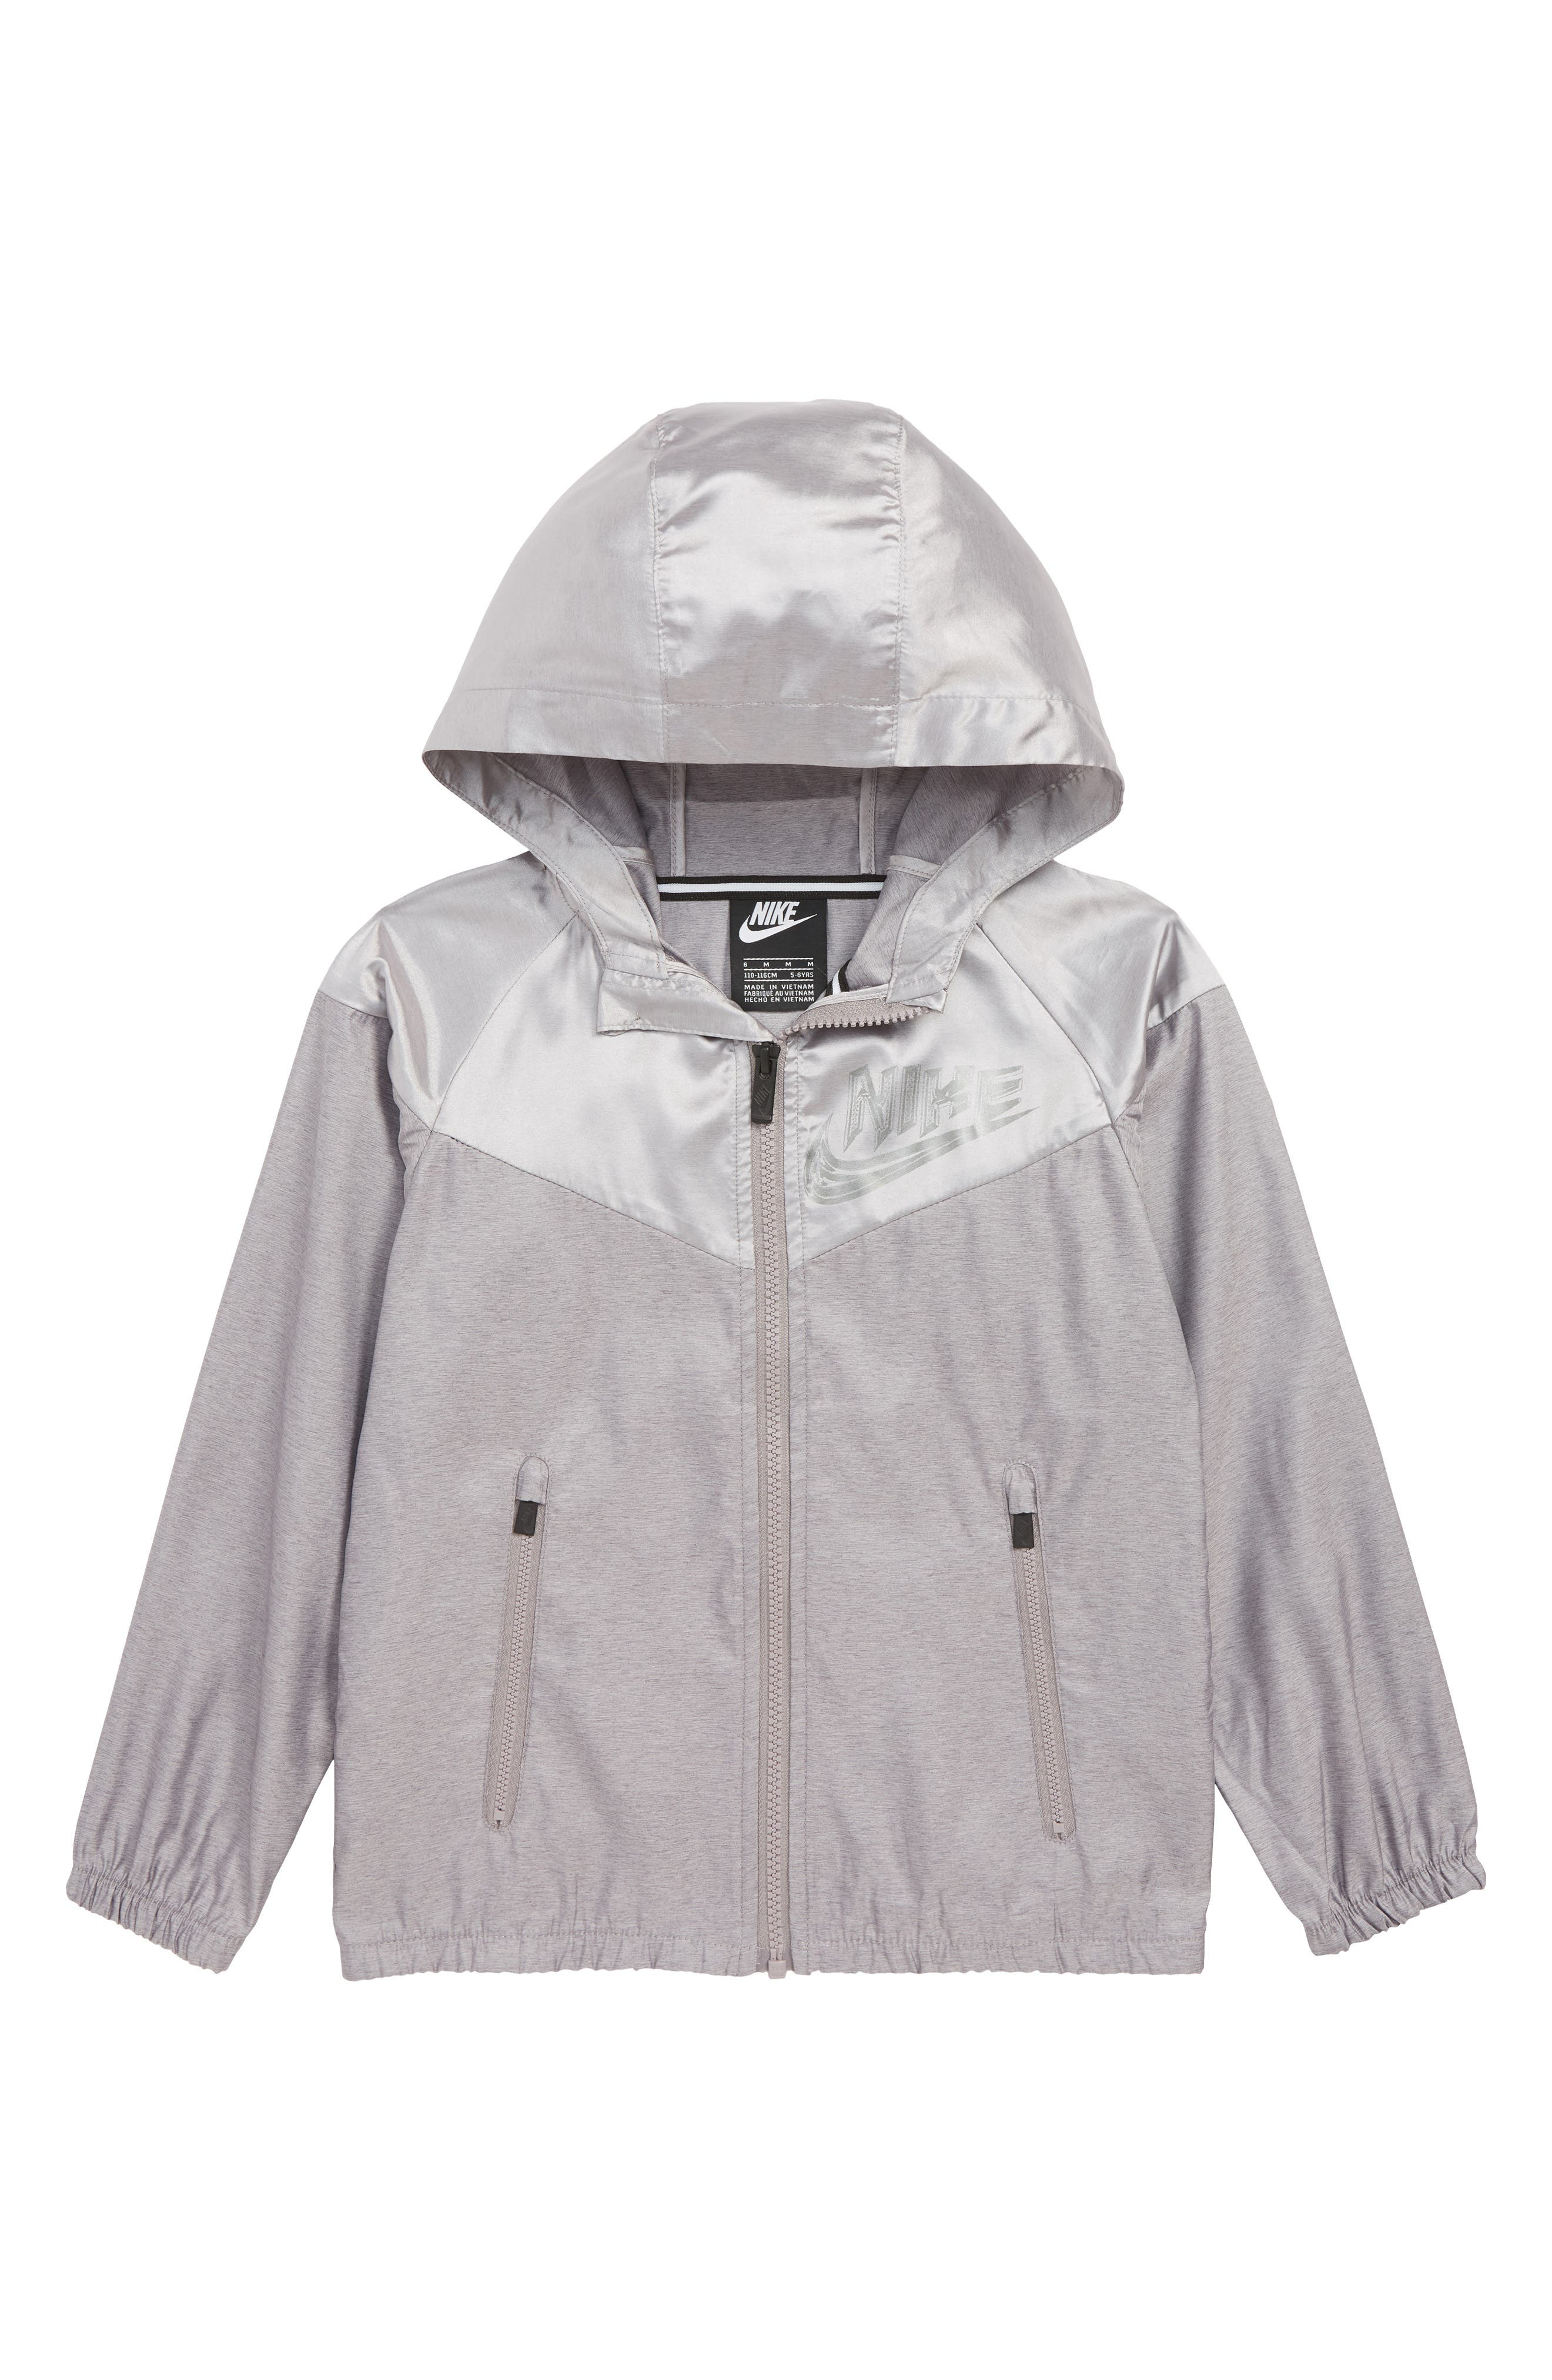 NIKE,                             Sportswear Windrunner Jacket,                             Main thumbnail 1, color,                             GUNSMOKE